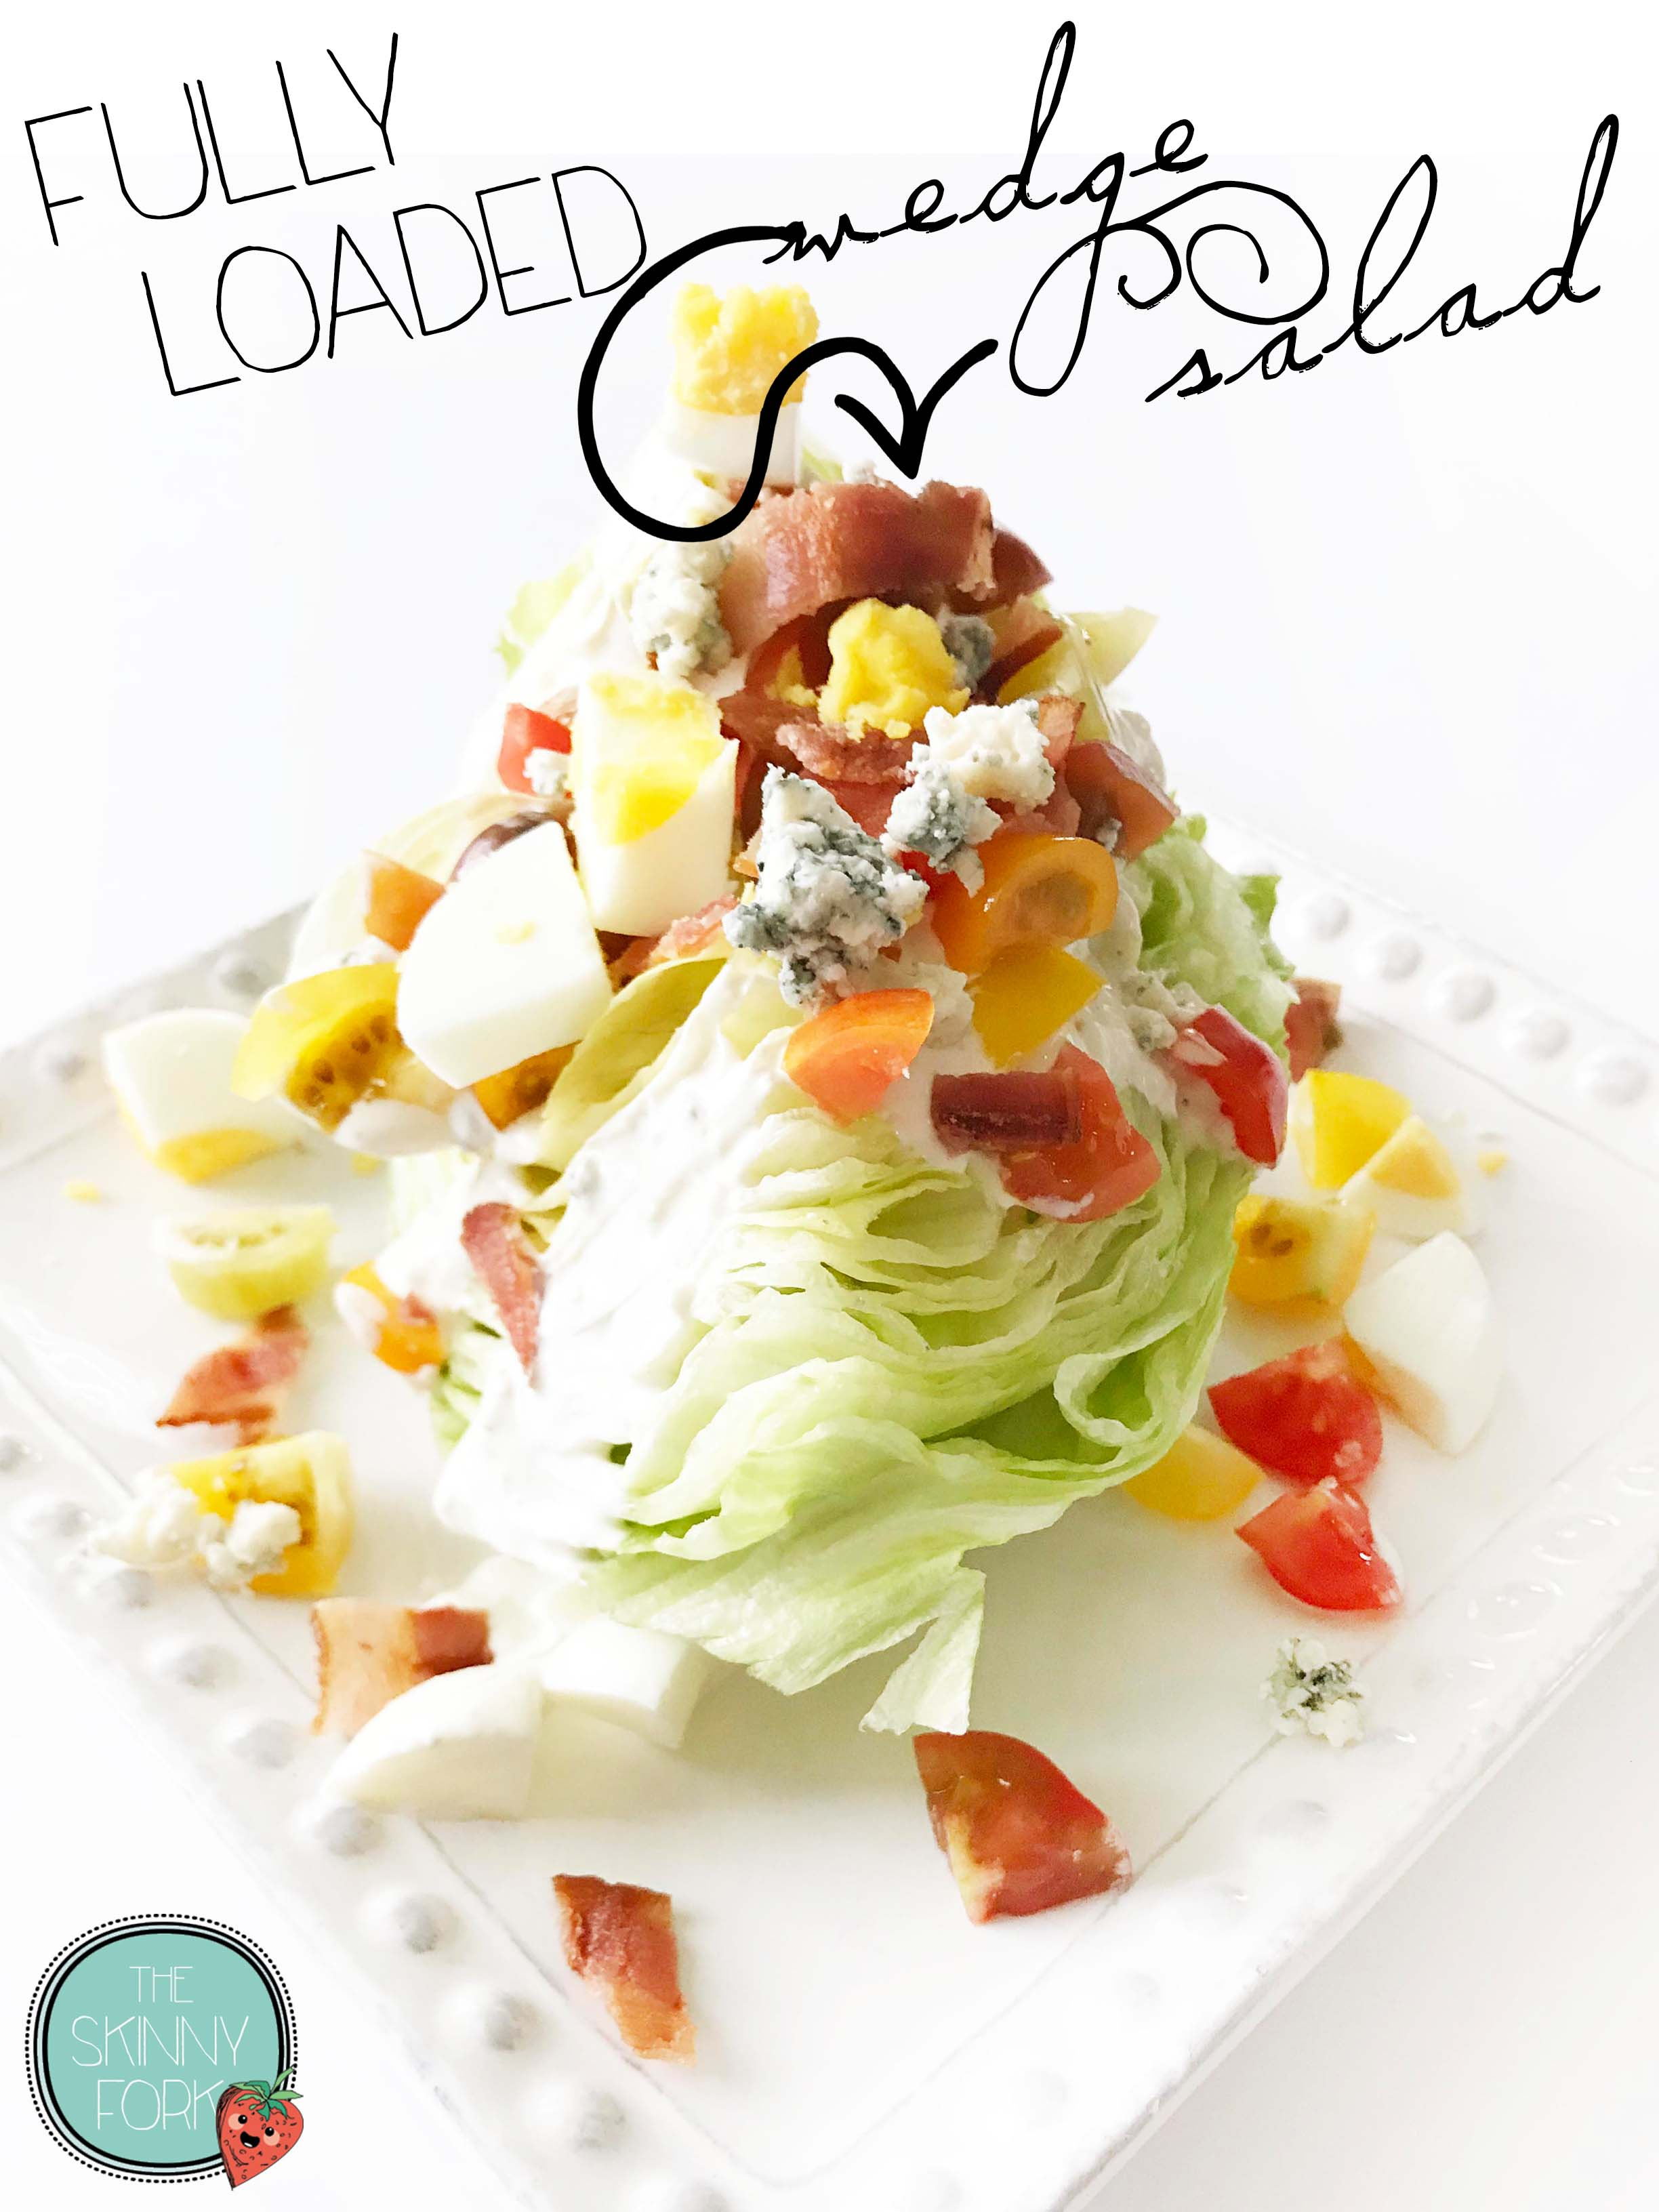 wedge-salad-pin.jpg